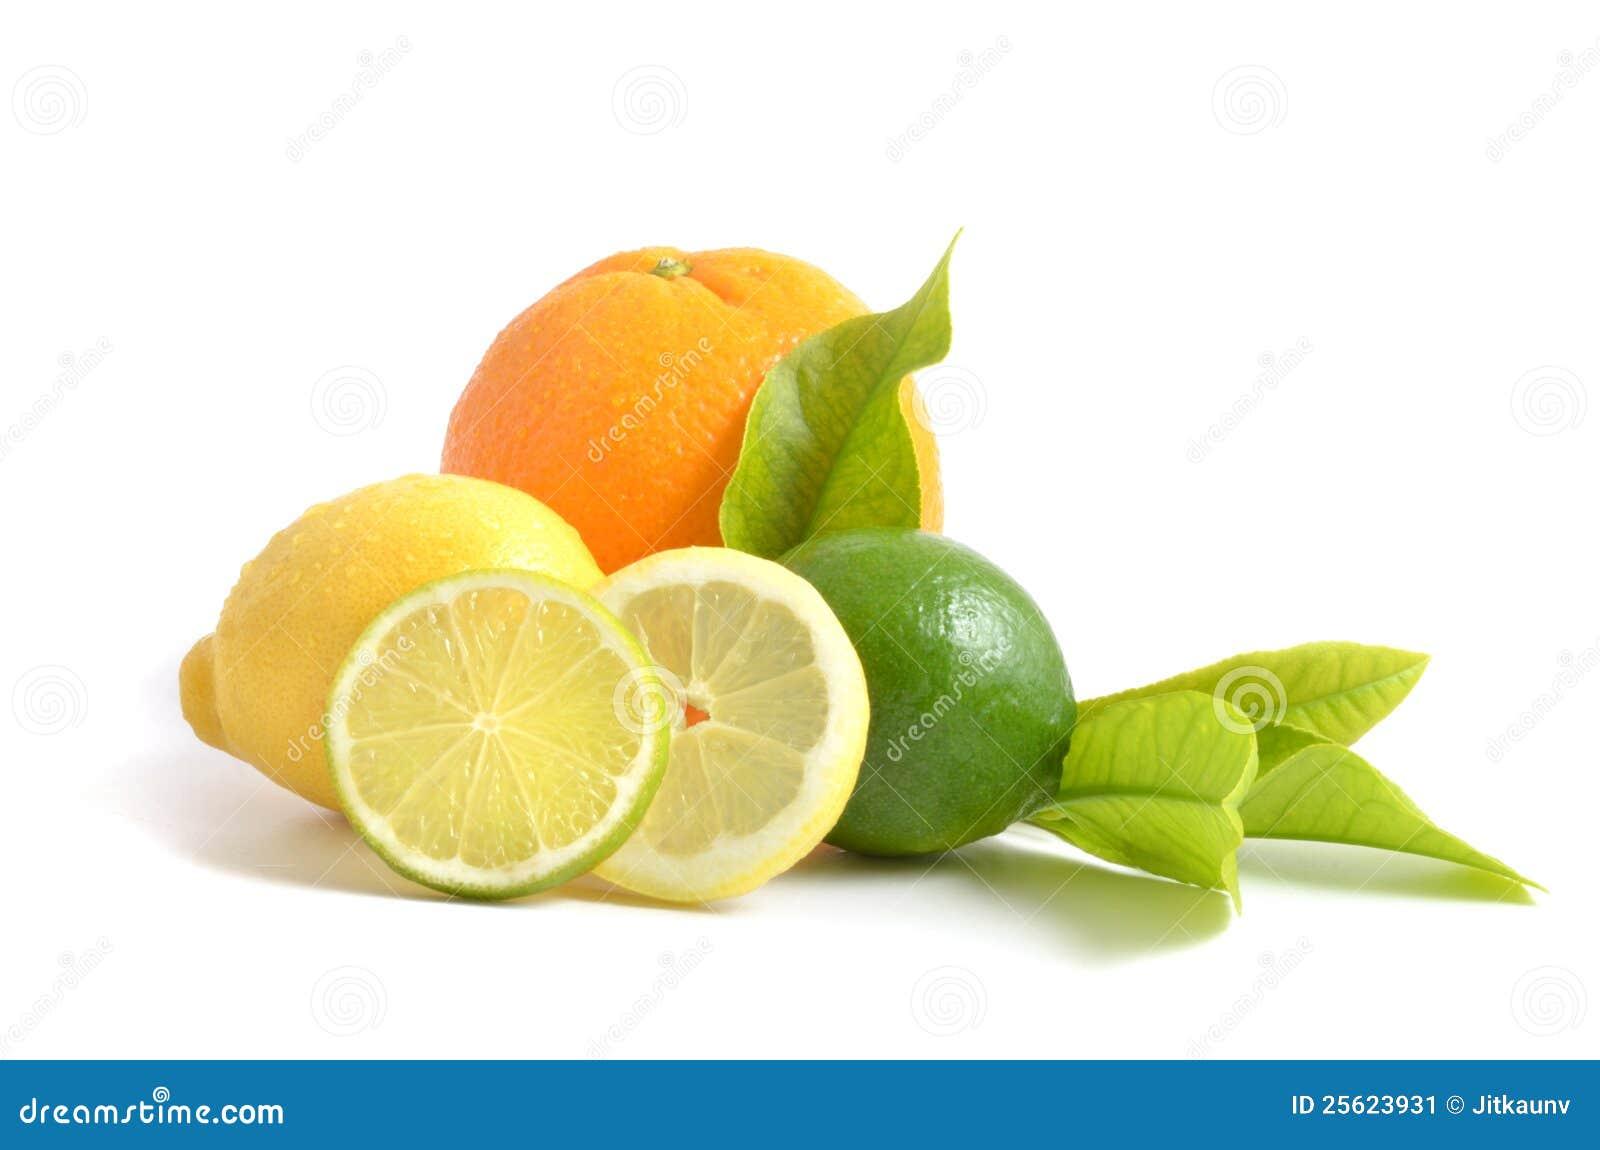 Citron, orange och limefrukt